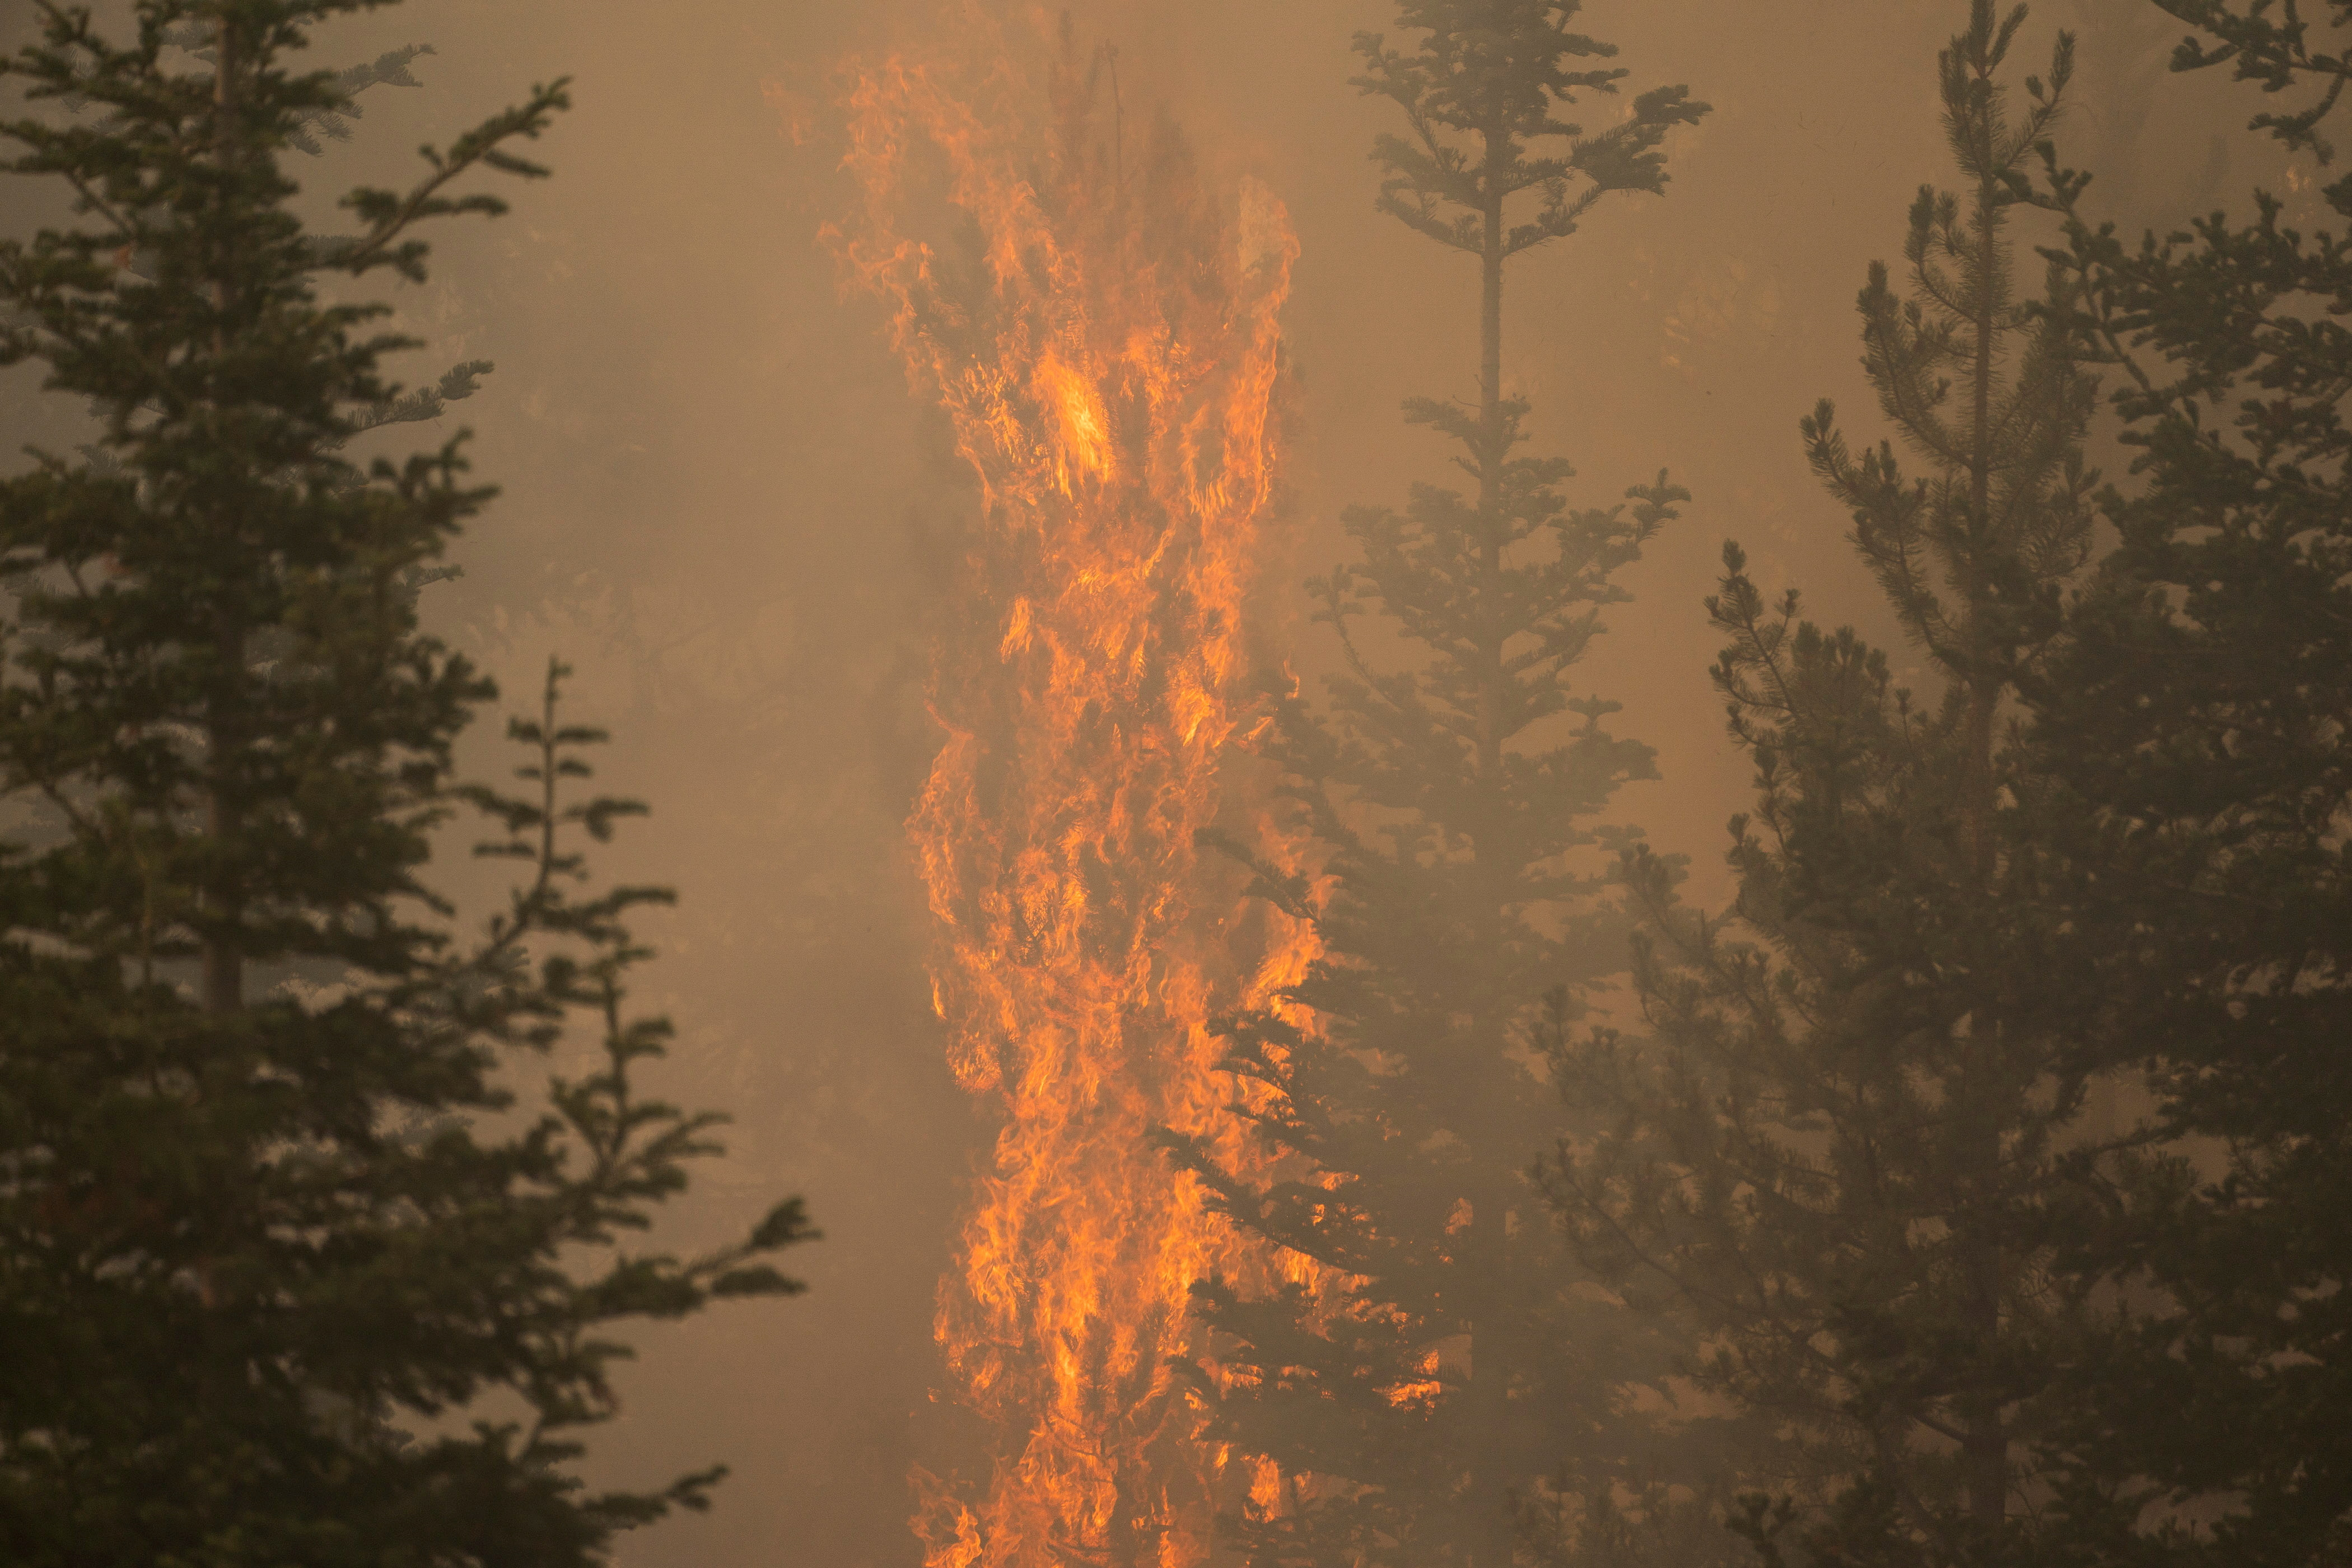 The Bootleg Fire burns through vegetation near Paisley, Oregon, U.S., July 20, 2021. REUTERS/David Ryder